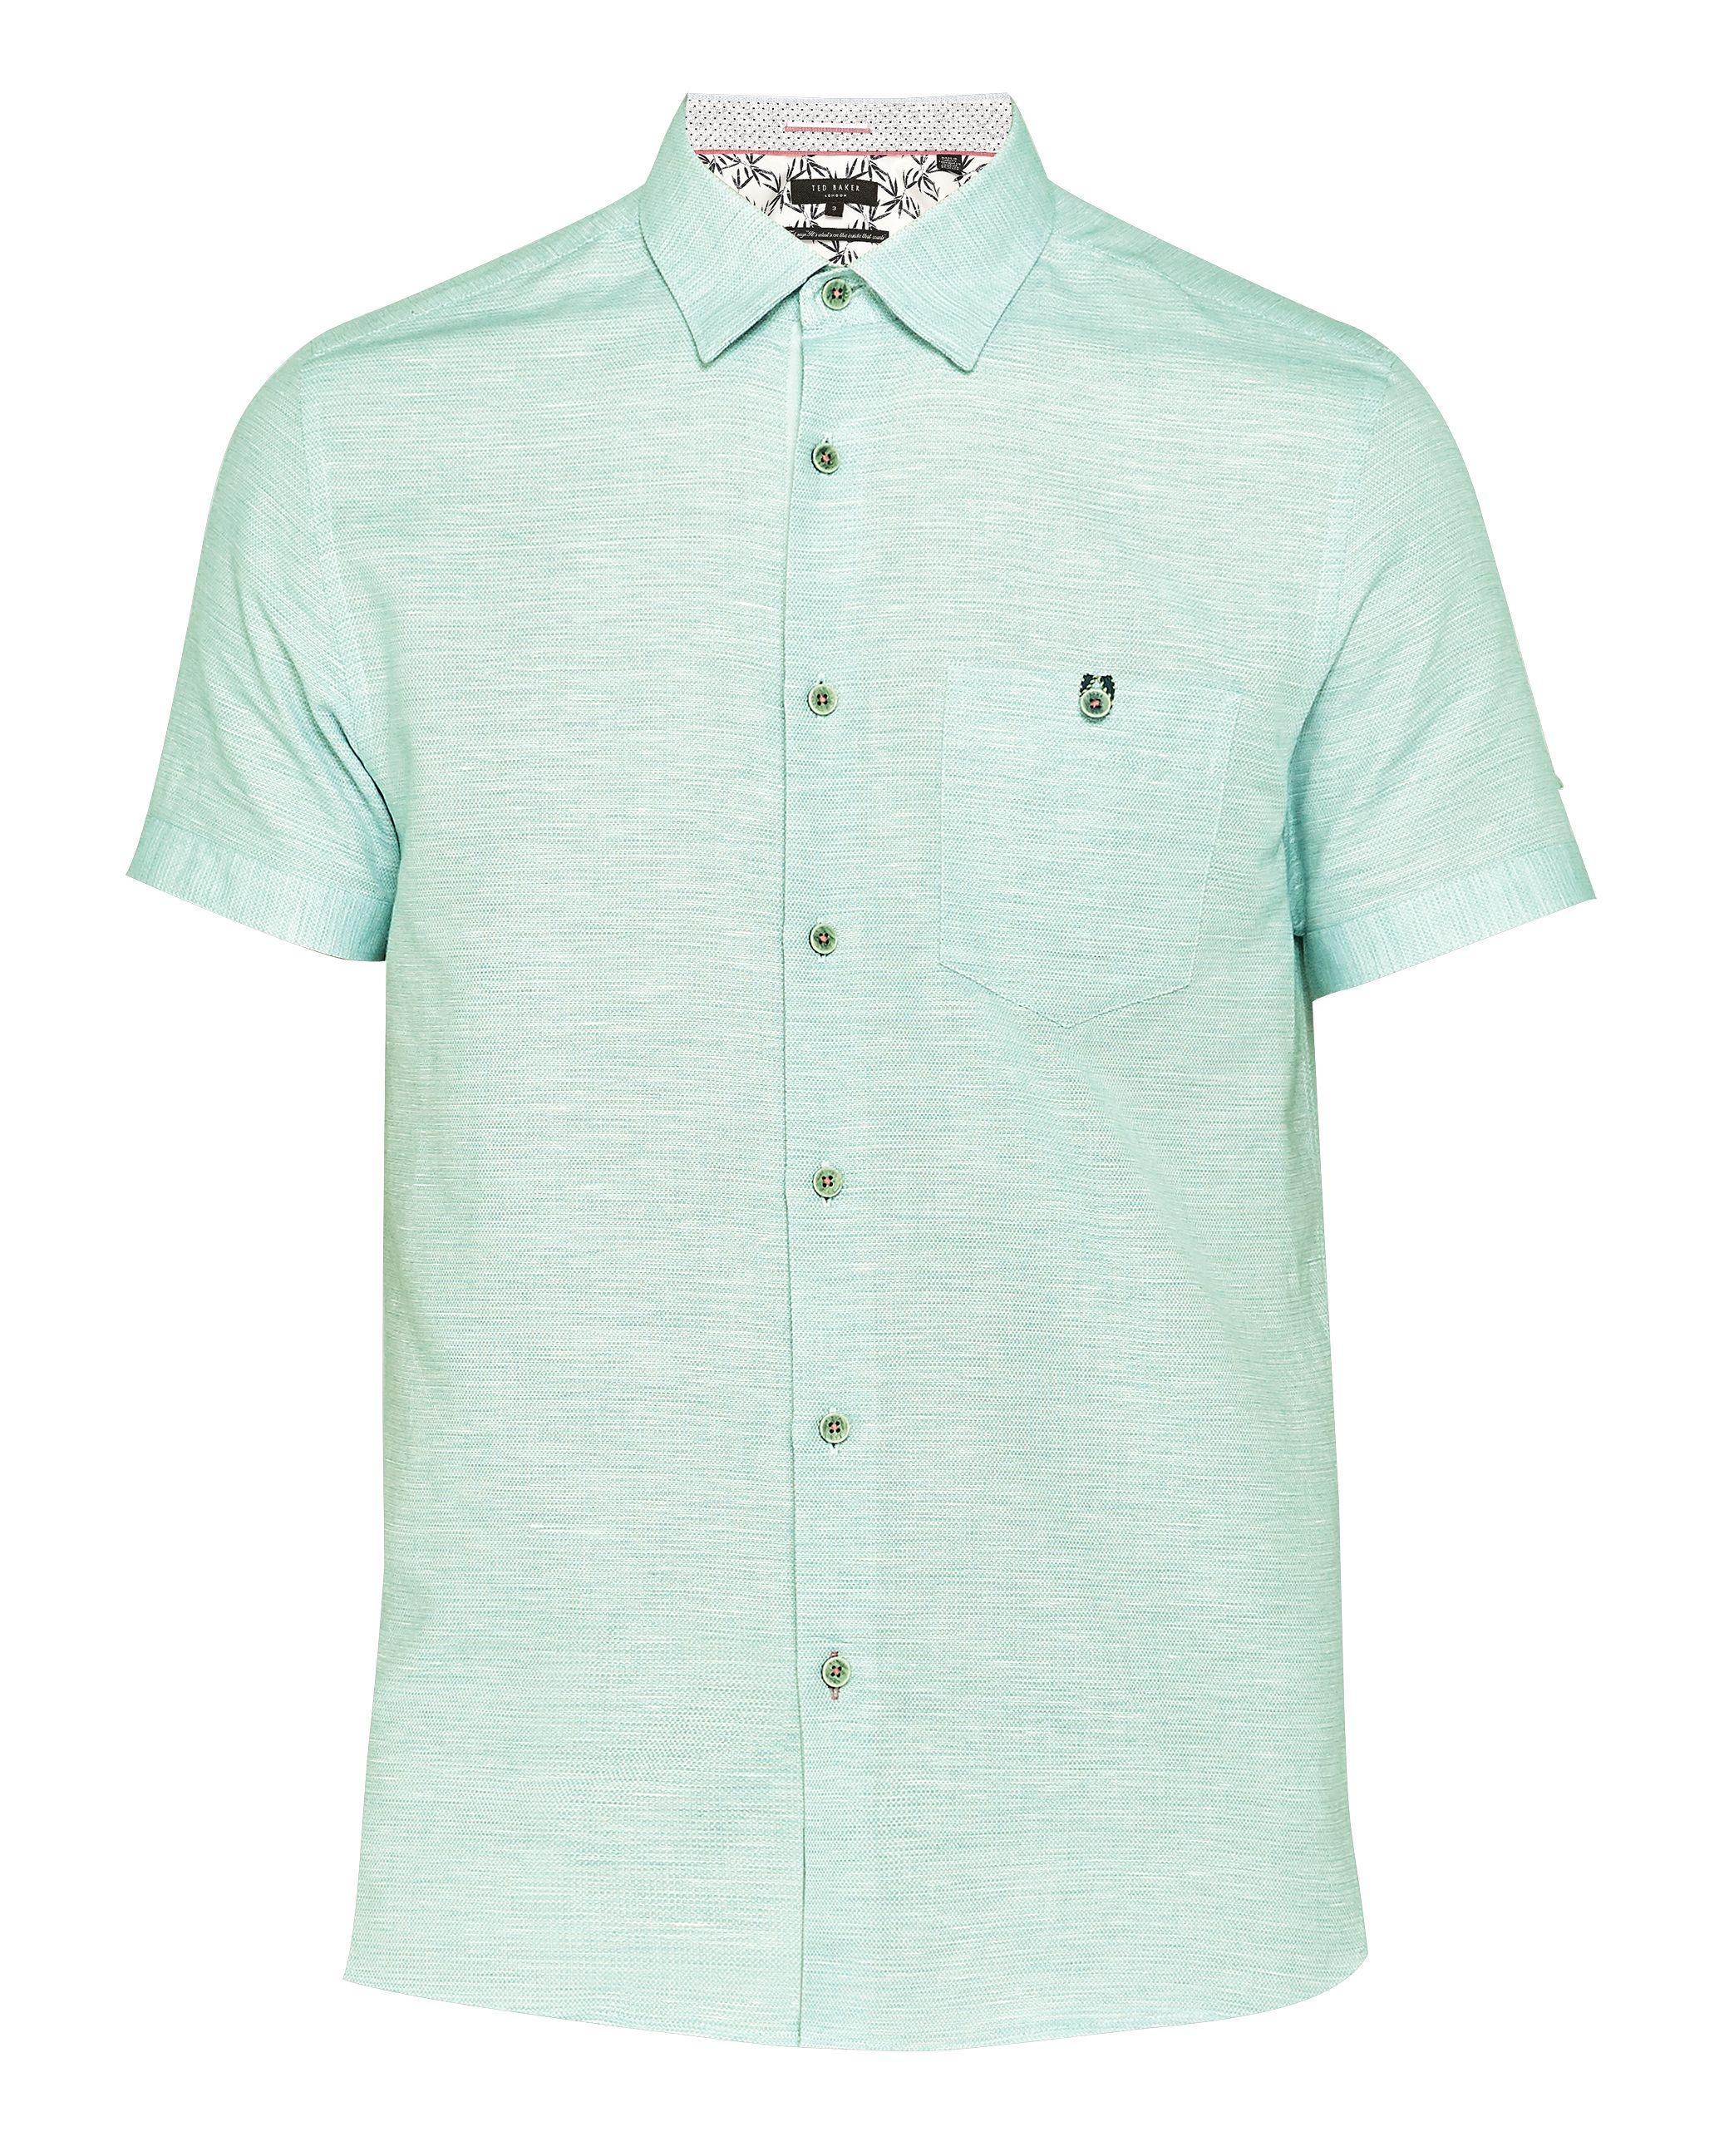 0ce9c794487d73 Ted Baker - Green Men s Peeze Linen Short Sleeved Shirt for Men - Lyst.  View fullscreen